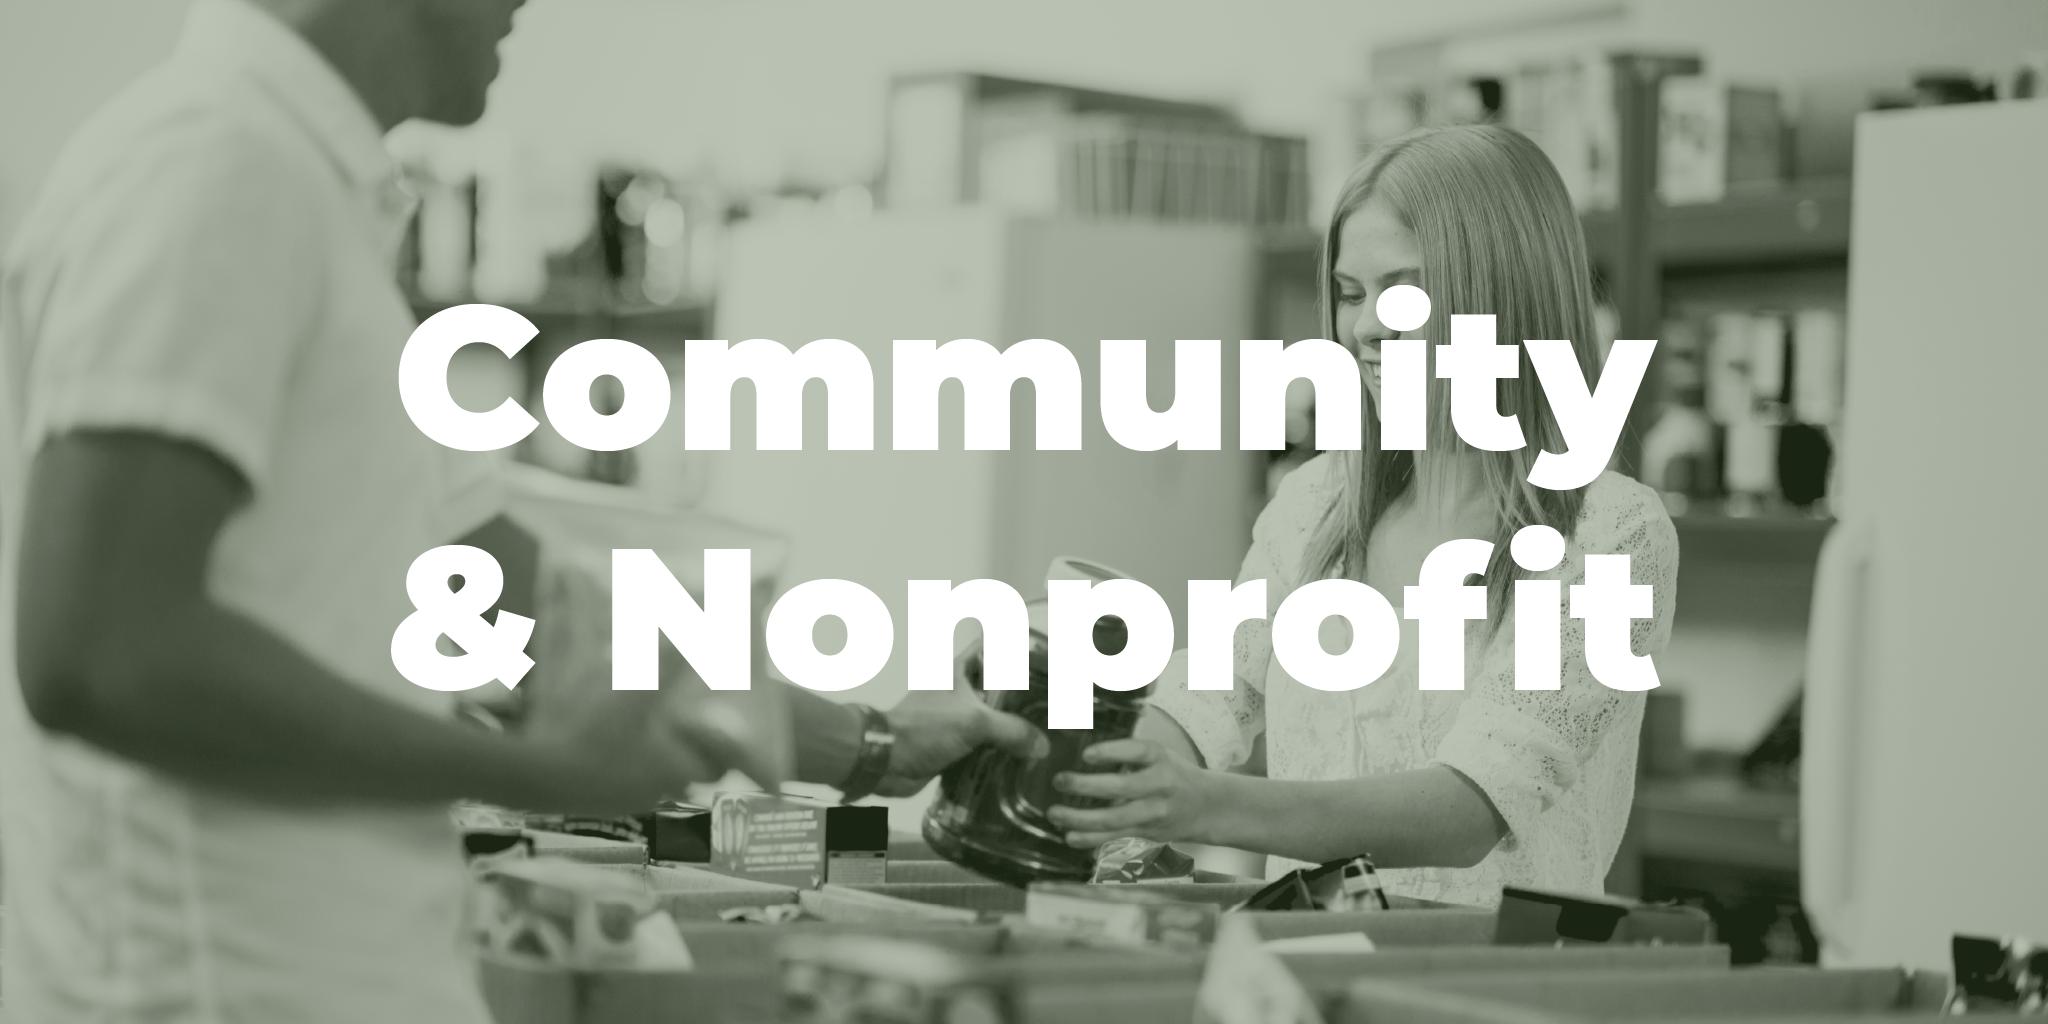 Community & Nonprofit